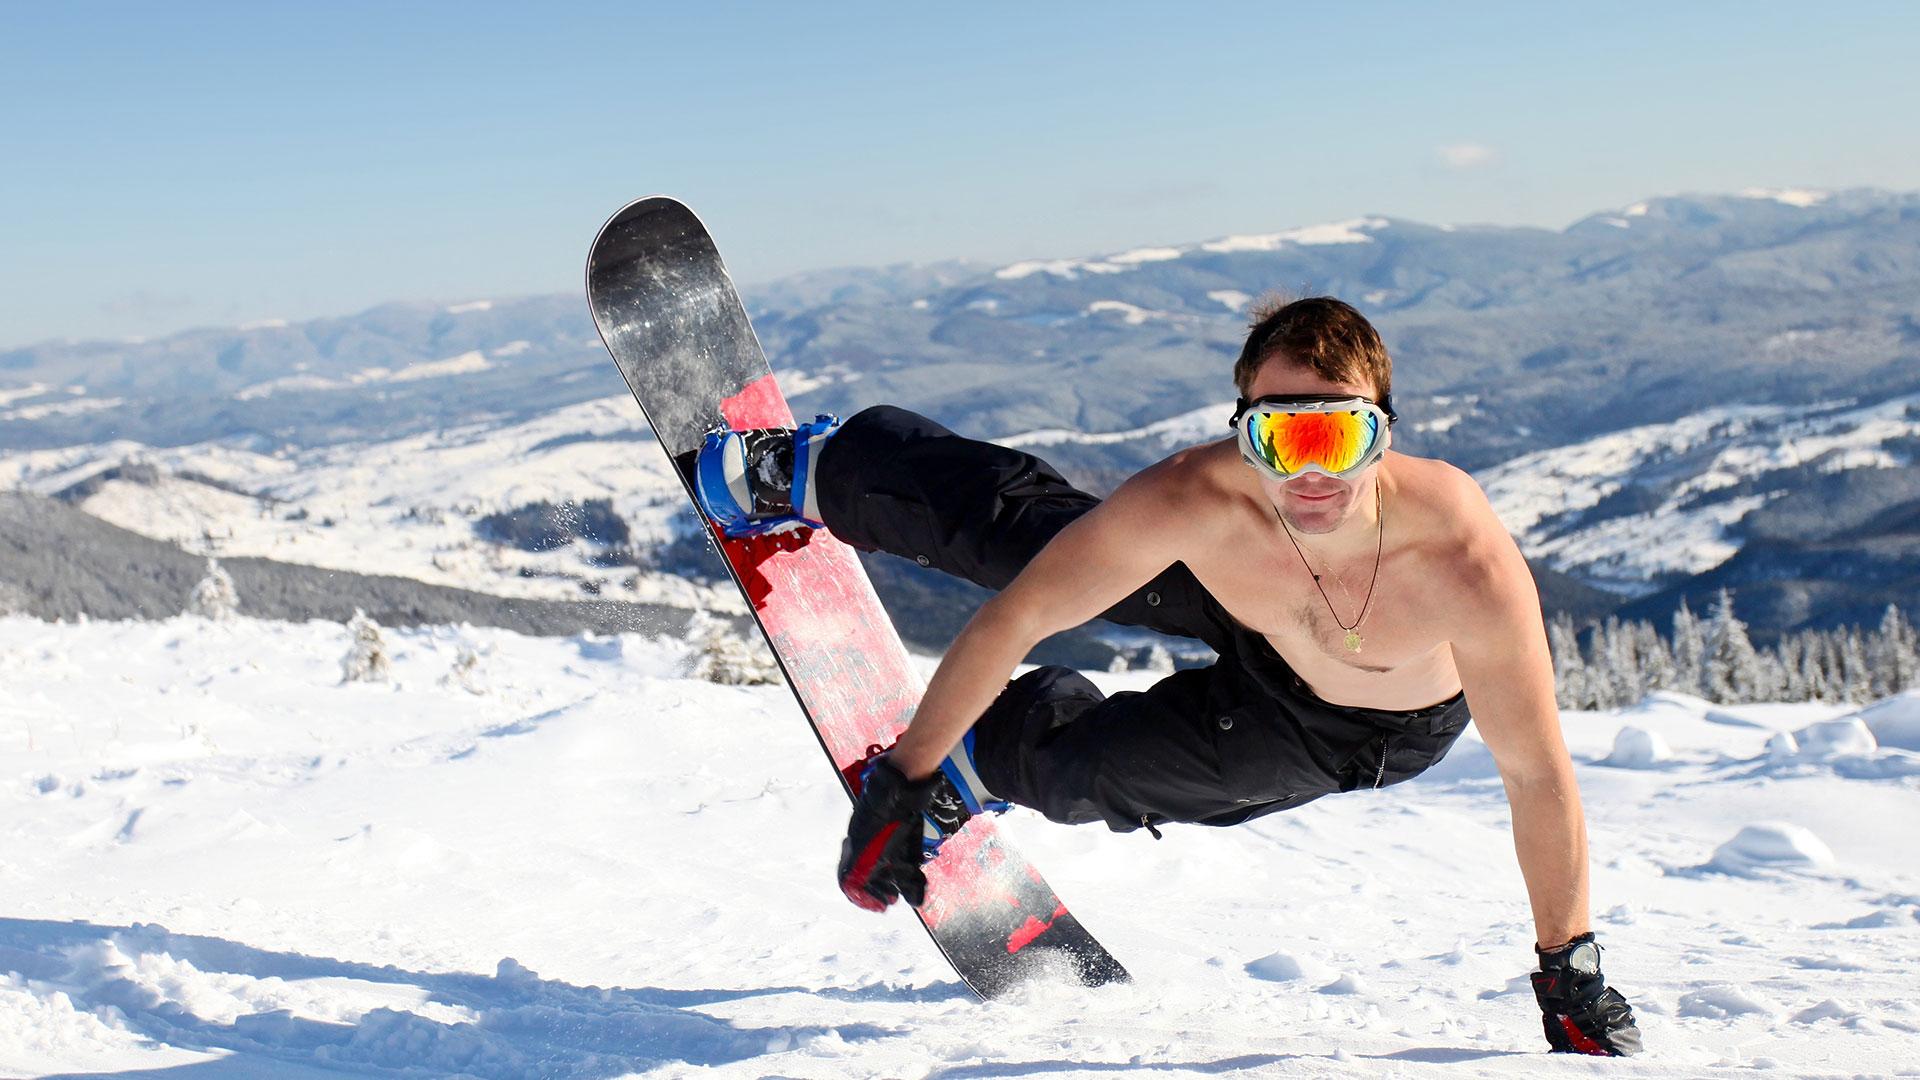 Gay skier cock